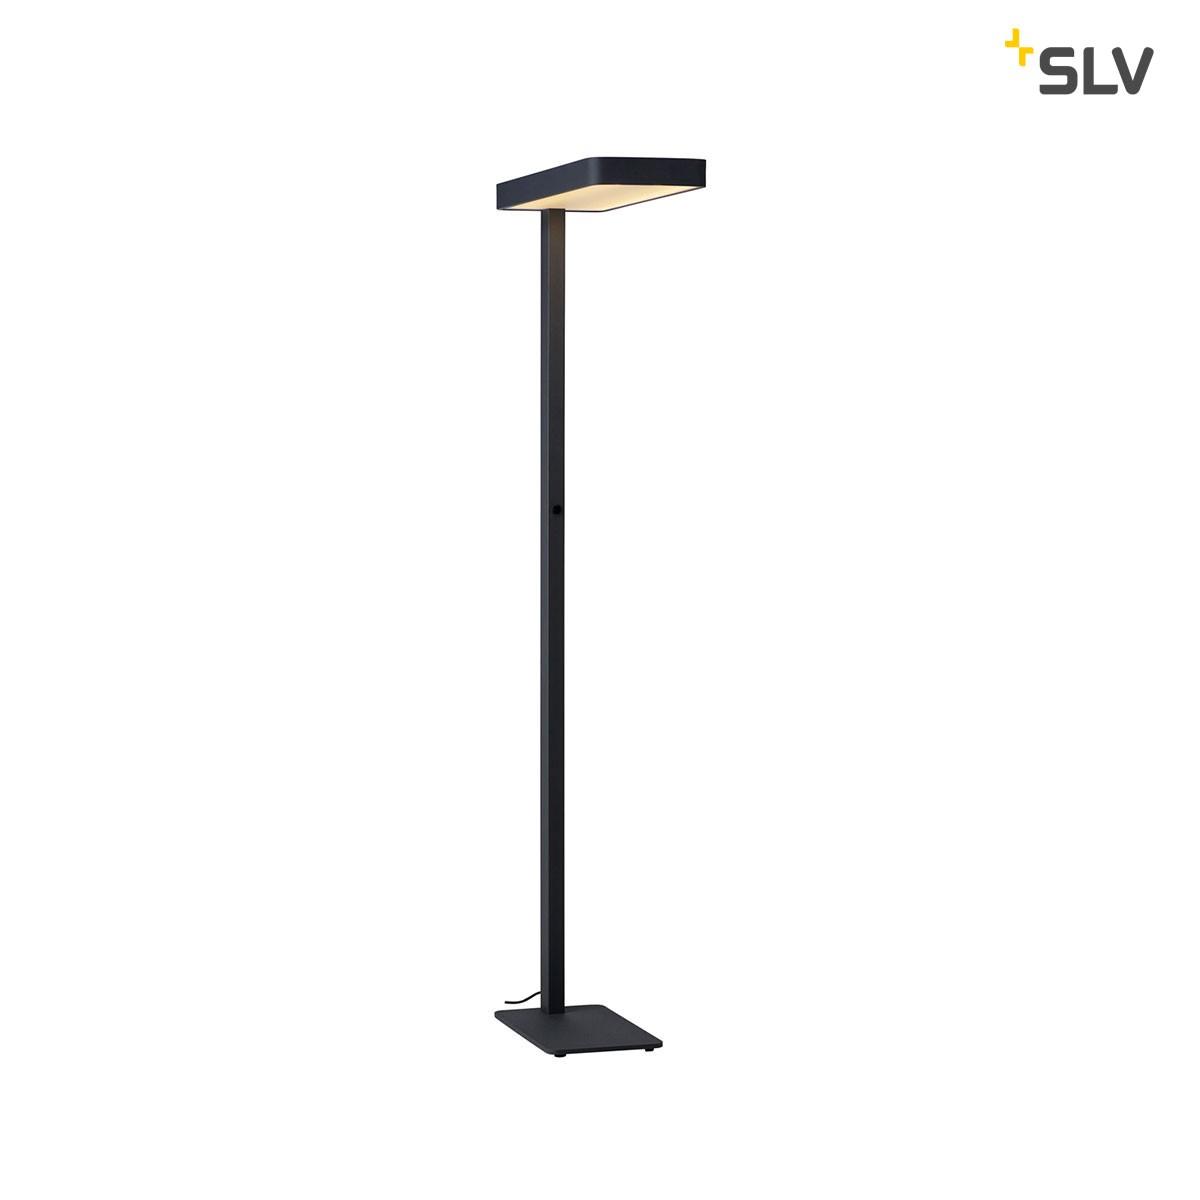 SLV Worklight LED SL-2 Stehleuchte, anthrazit